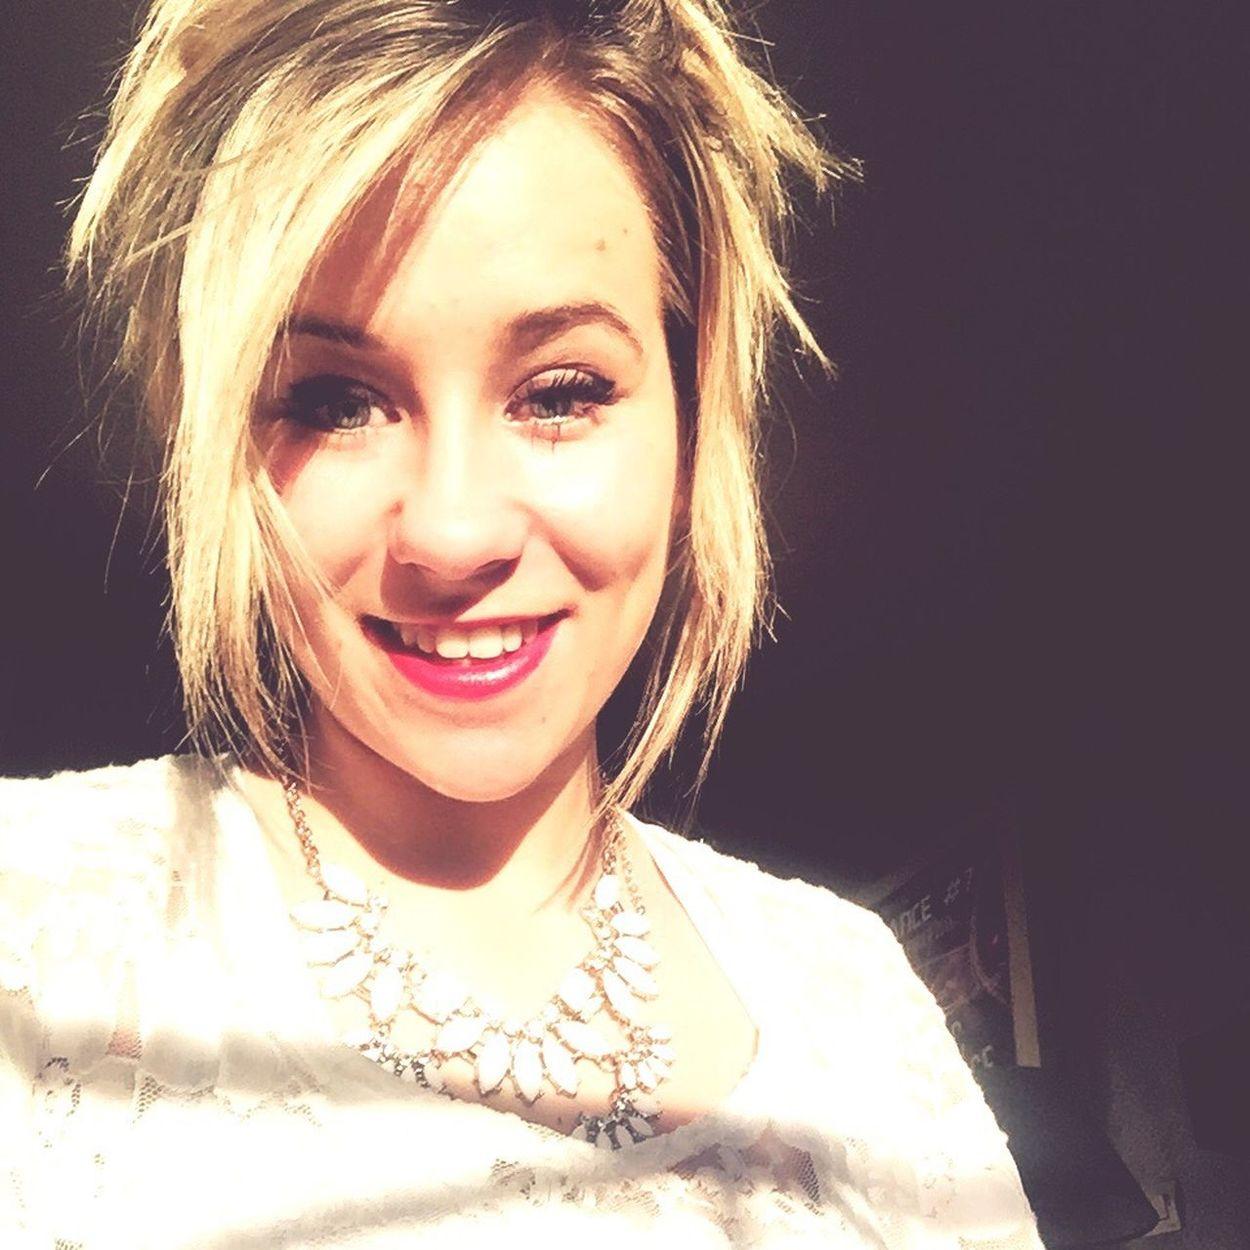 Cute Me Smile Blondie Blonde Girl Hairstyle BlueEyes White Dentelles Lyon